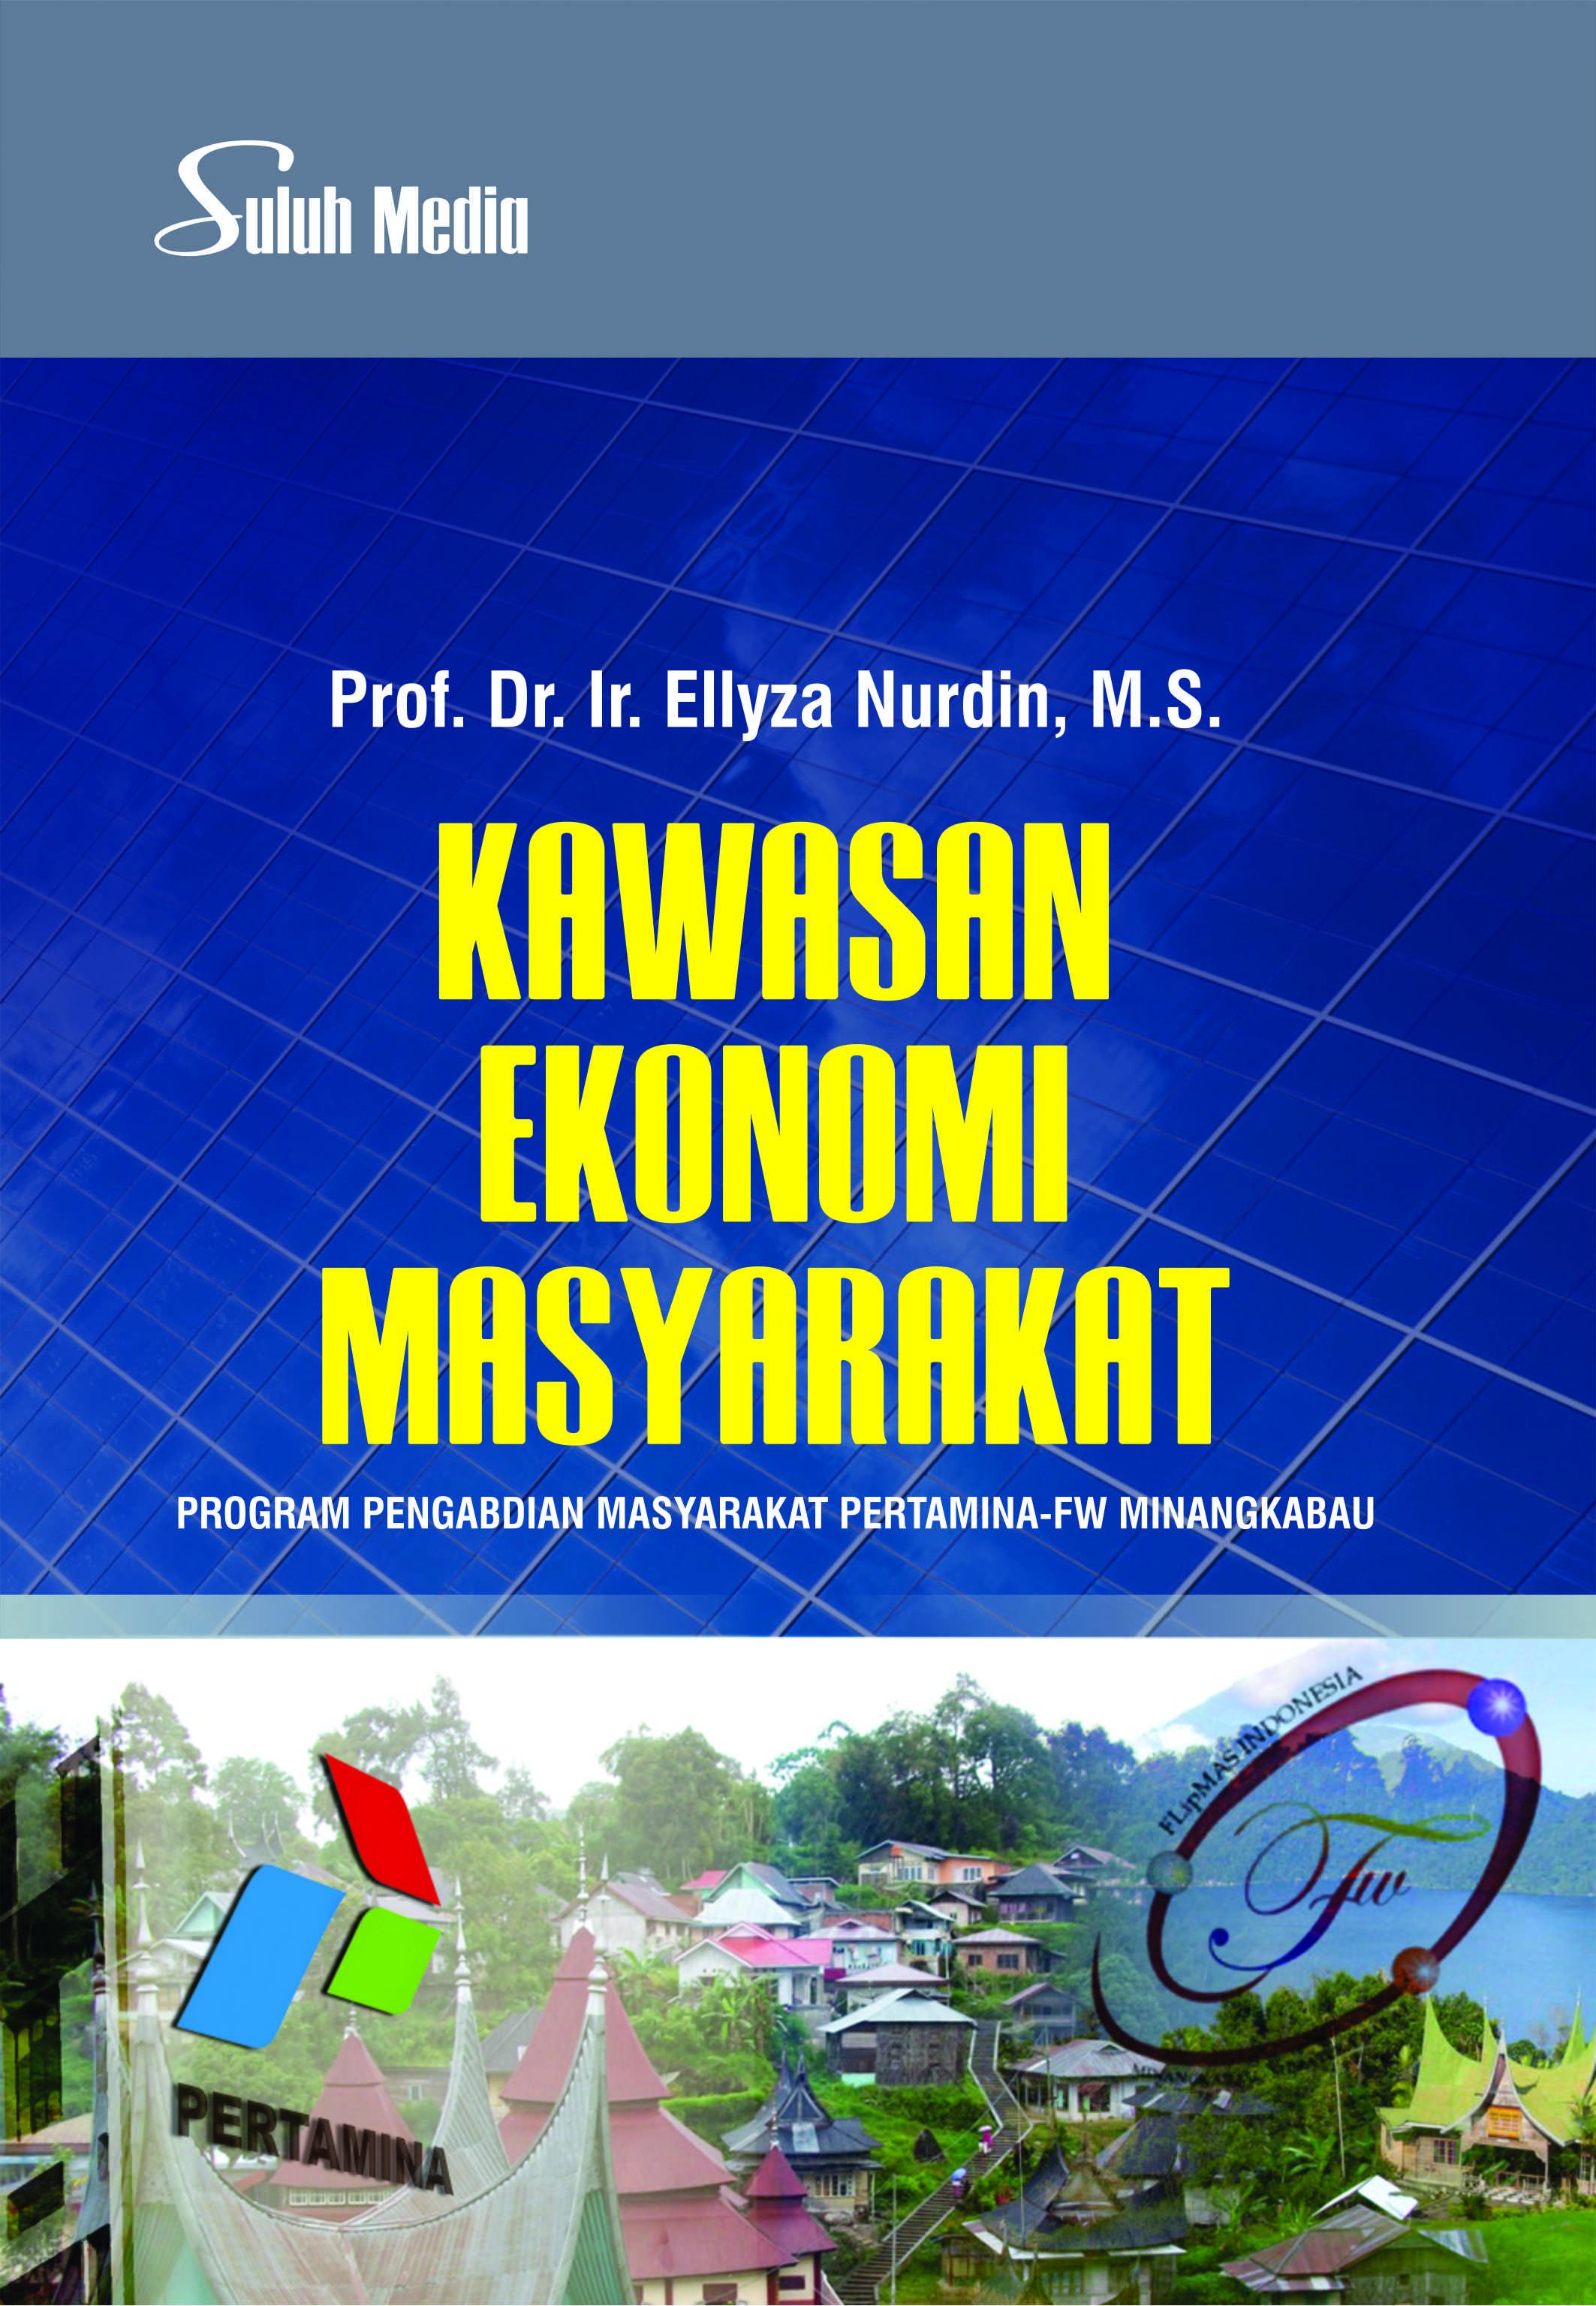 Kawasan ekonomi masyarakat; program pengabdian masyarakat pertamina - FW [sumber elektronis]